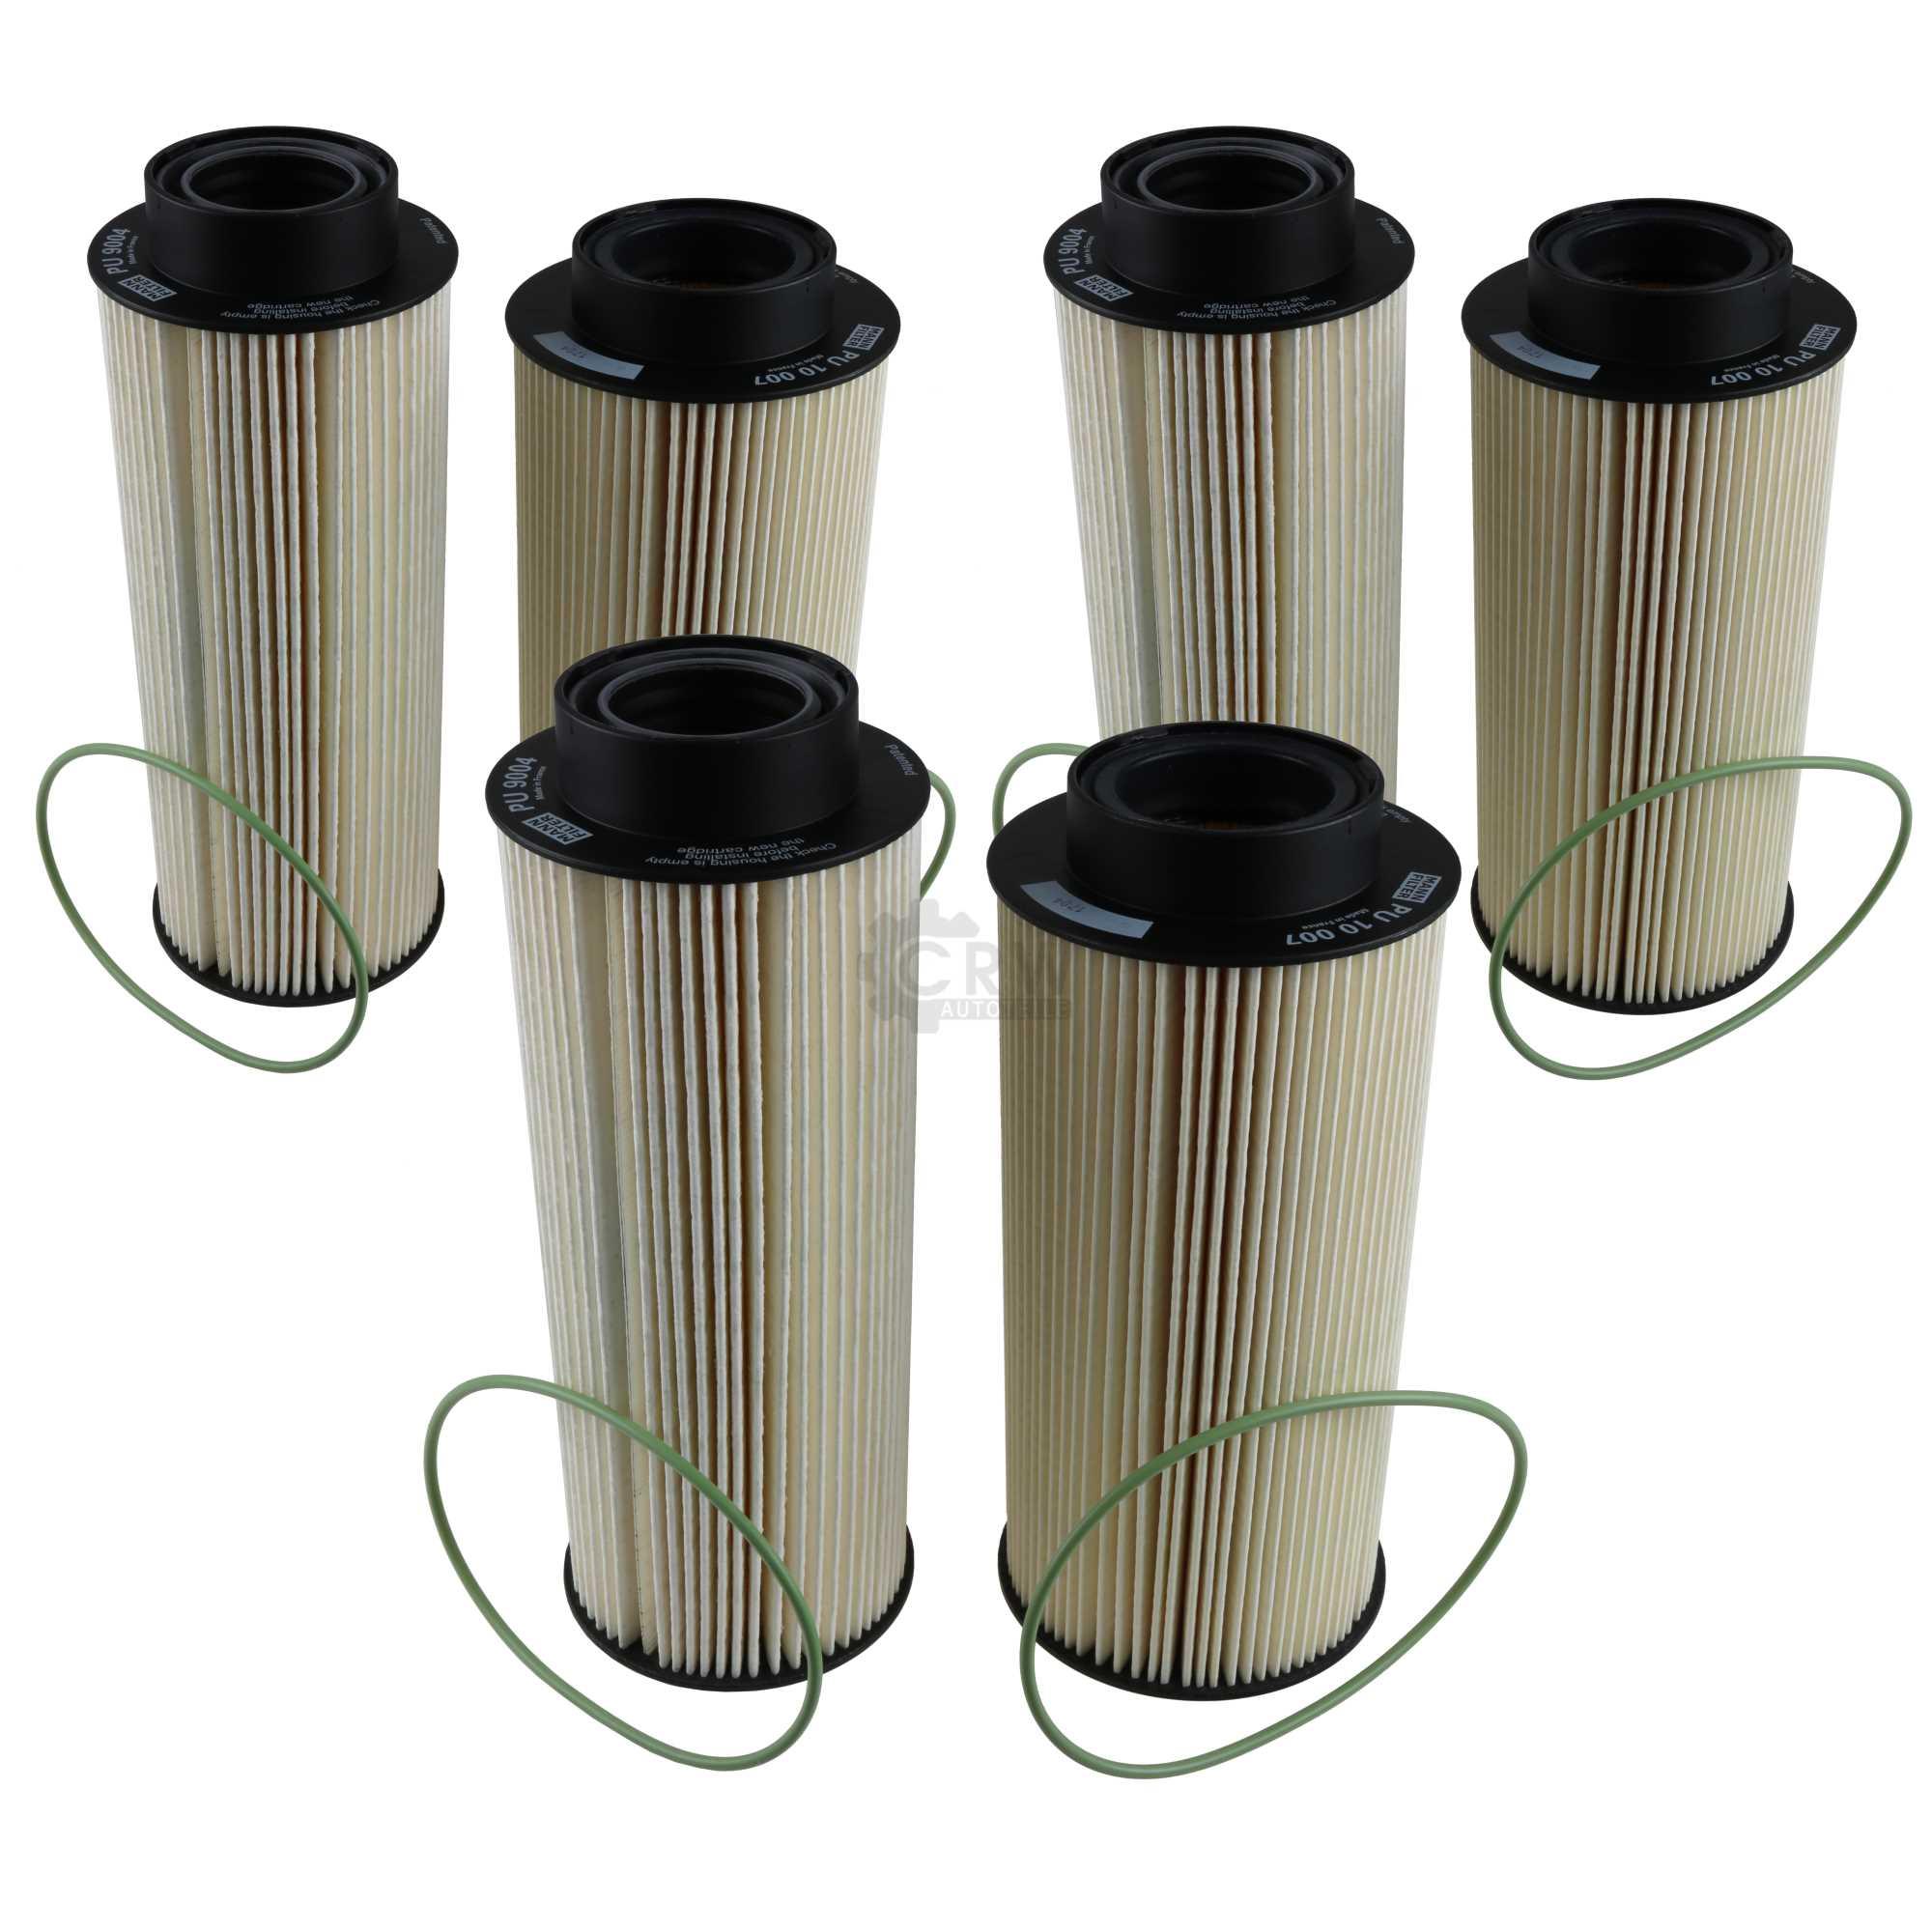 3x genuine mann filter fuel filter pu 10 003 2 x fuel filter ebay